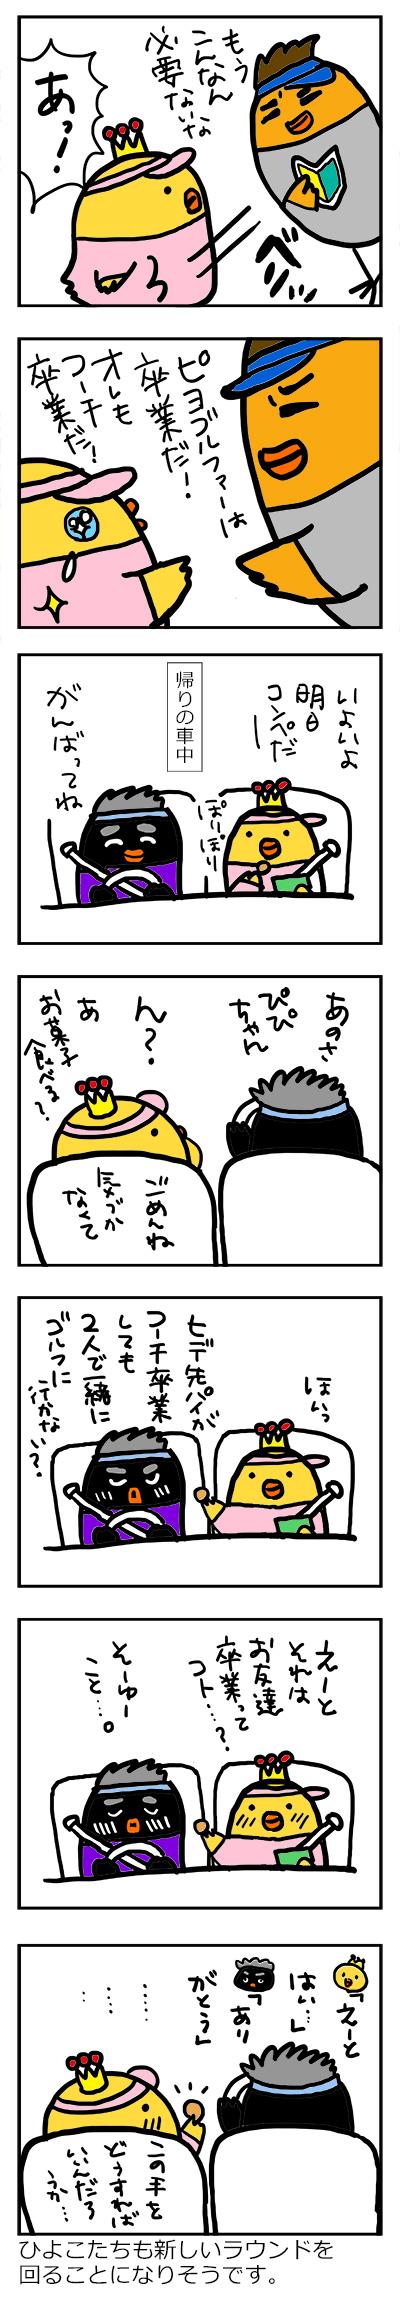 21_hina2